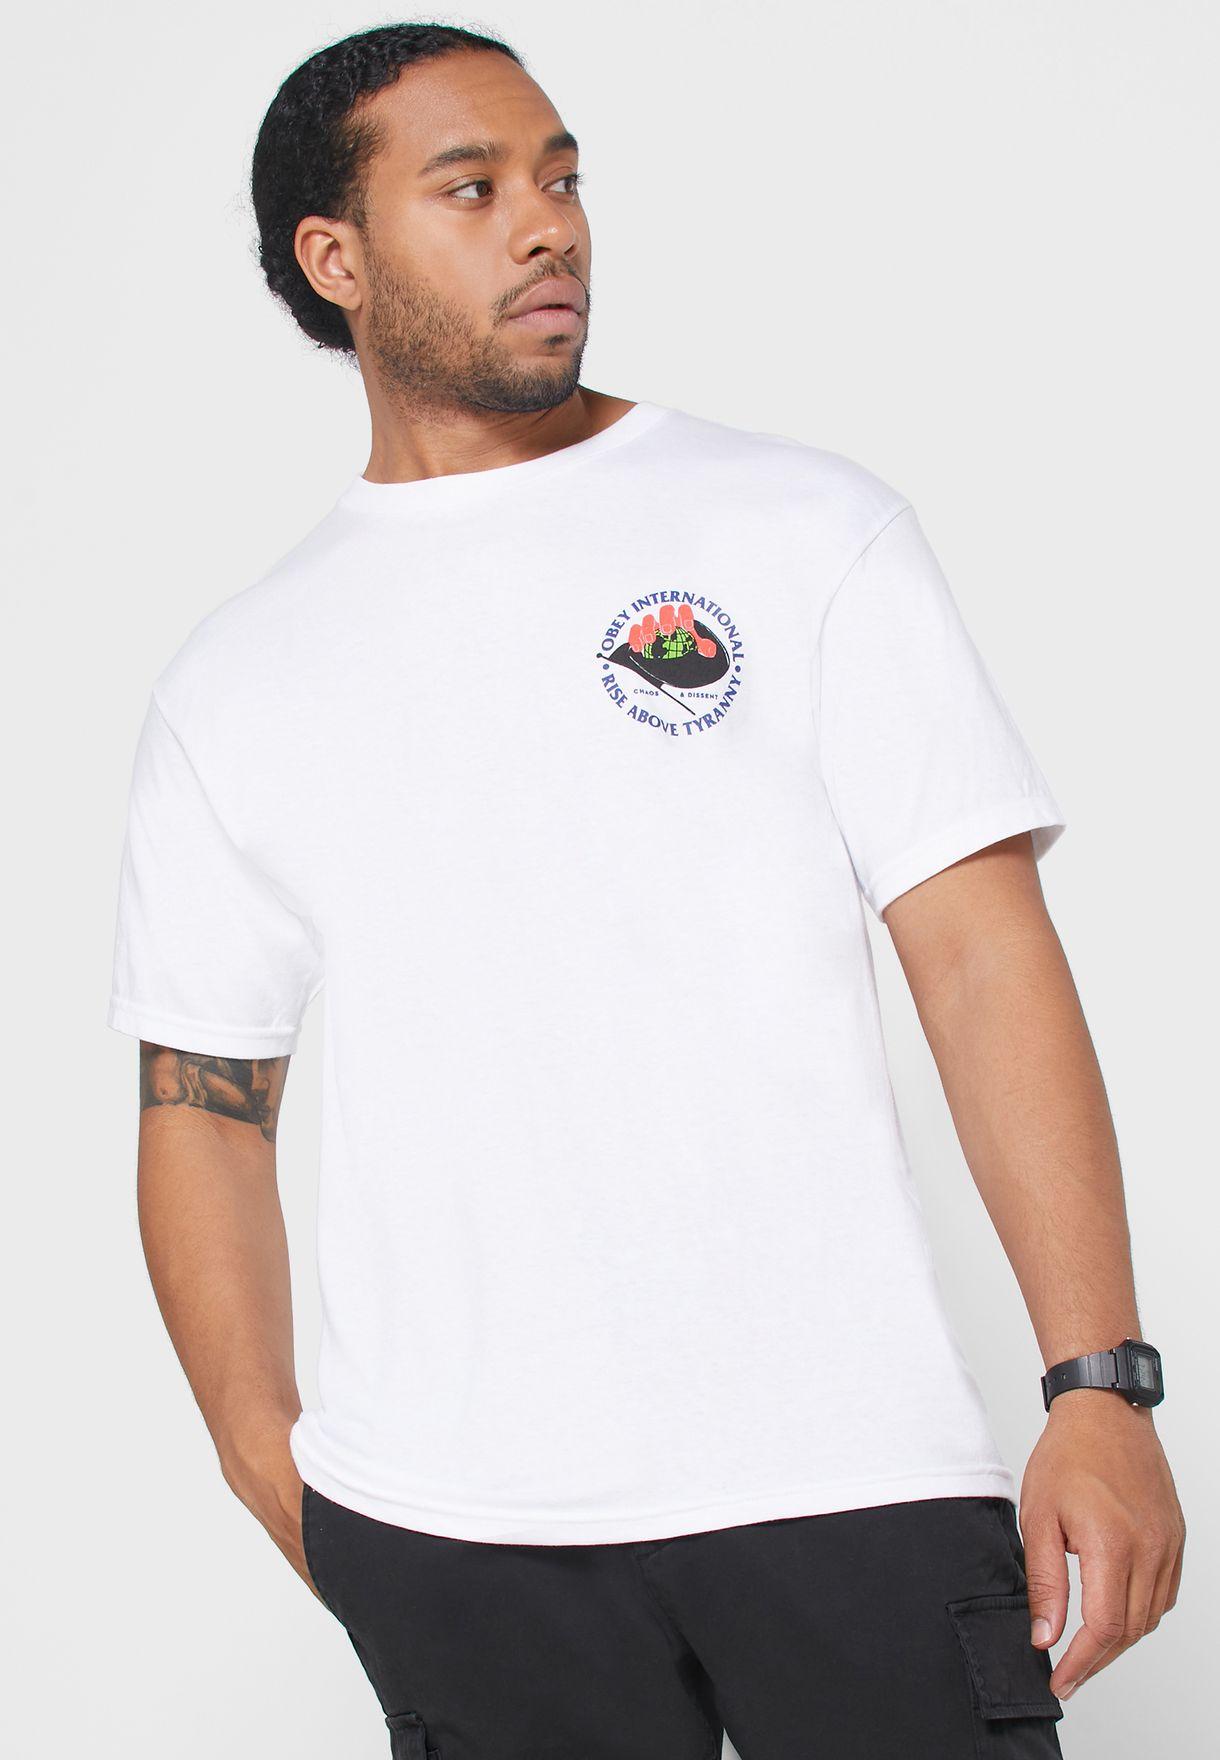 Rise Above Tyranny T-Shirt